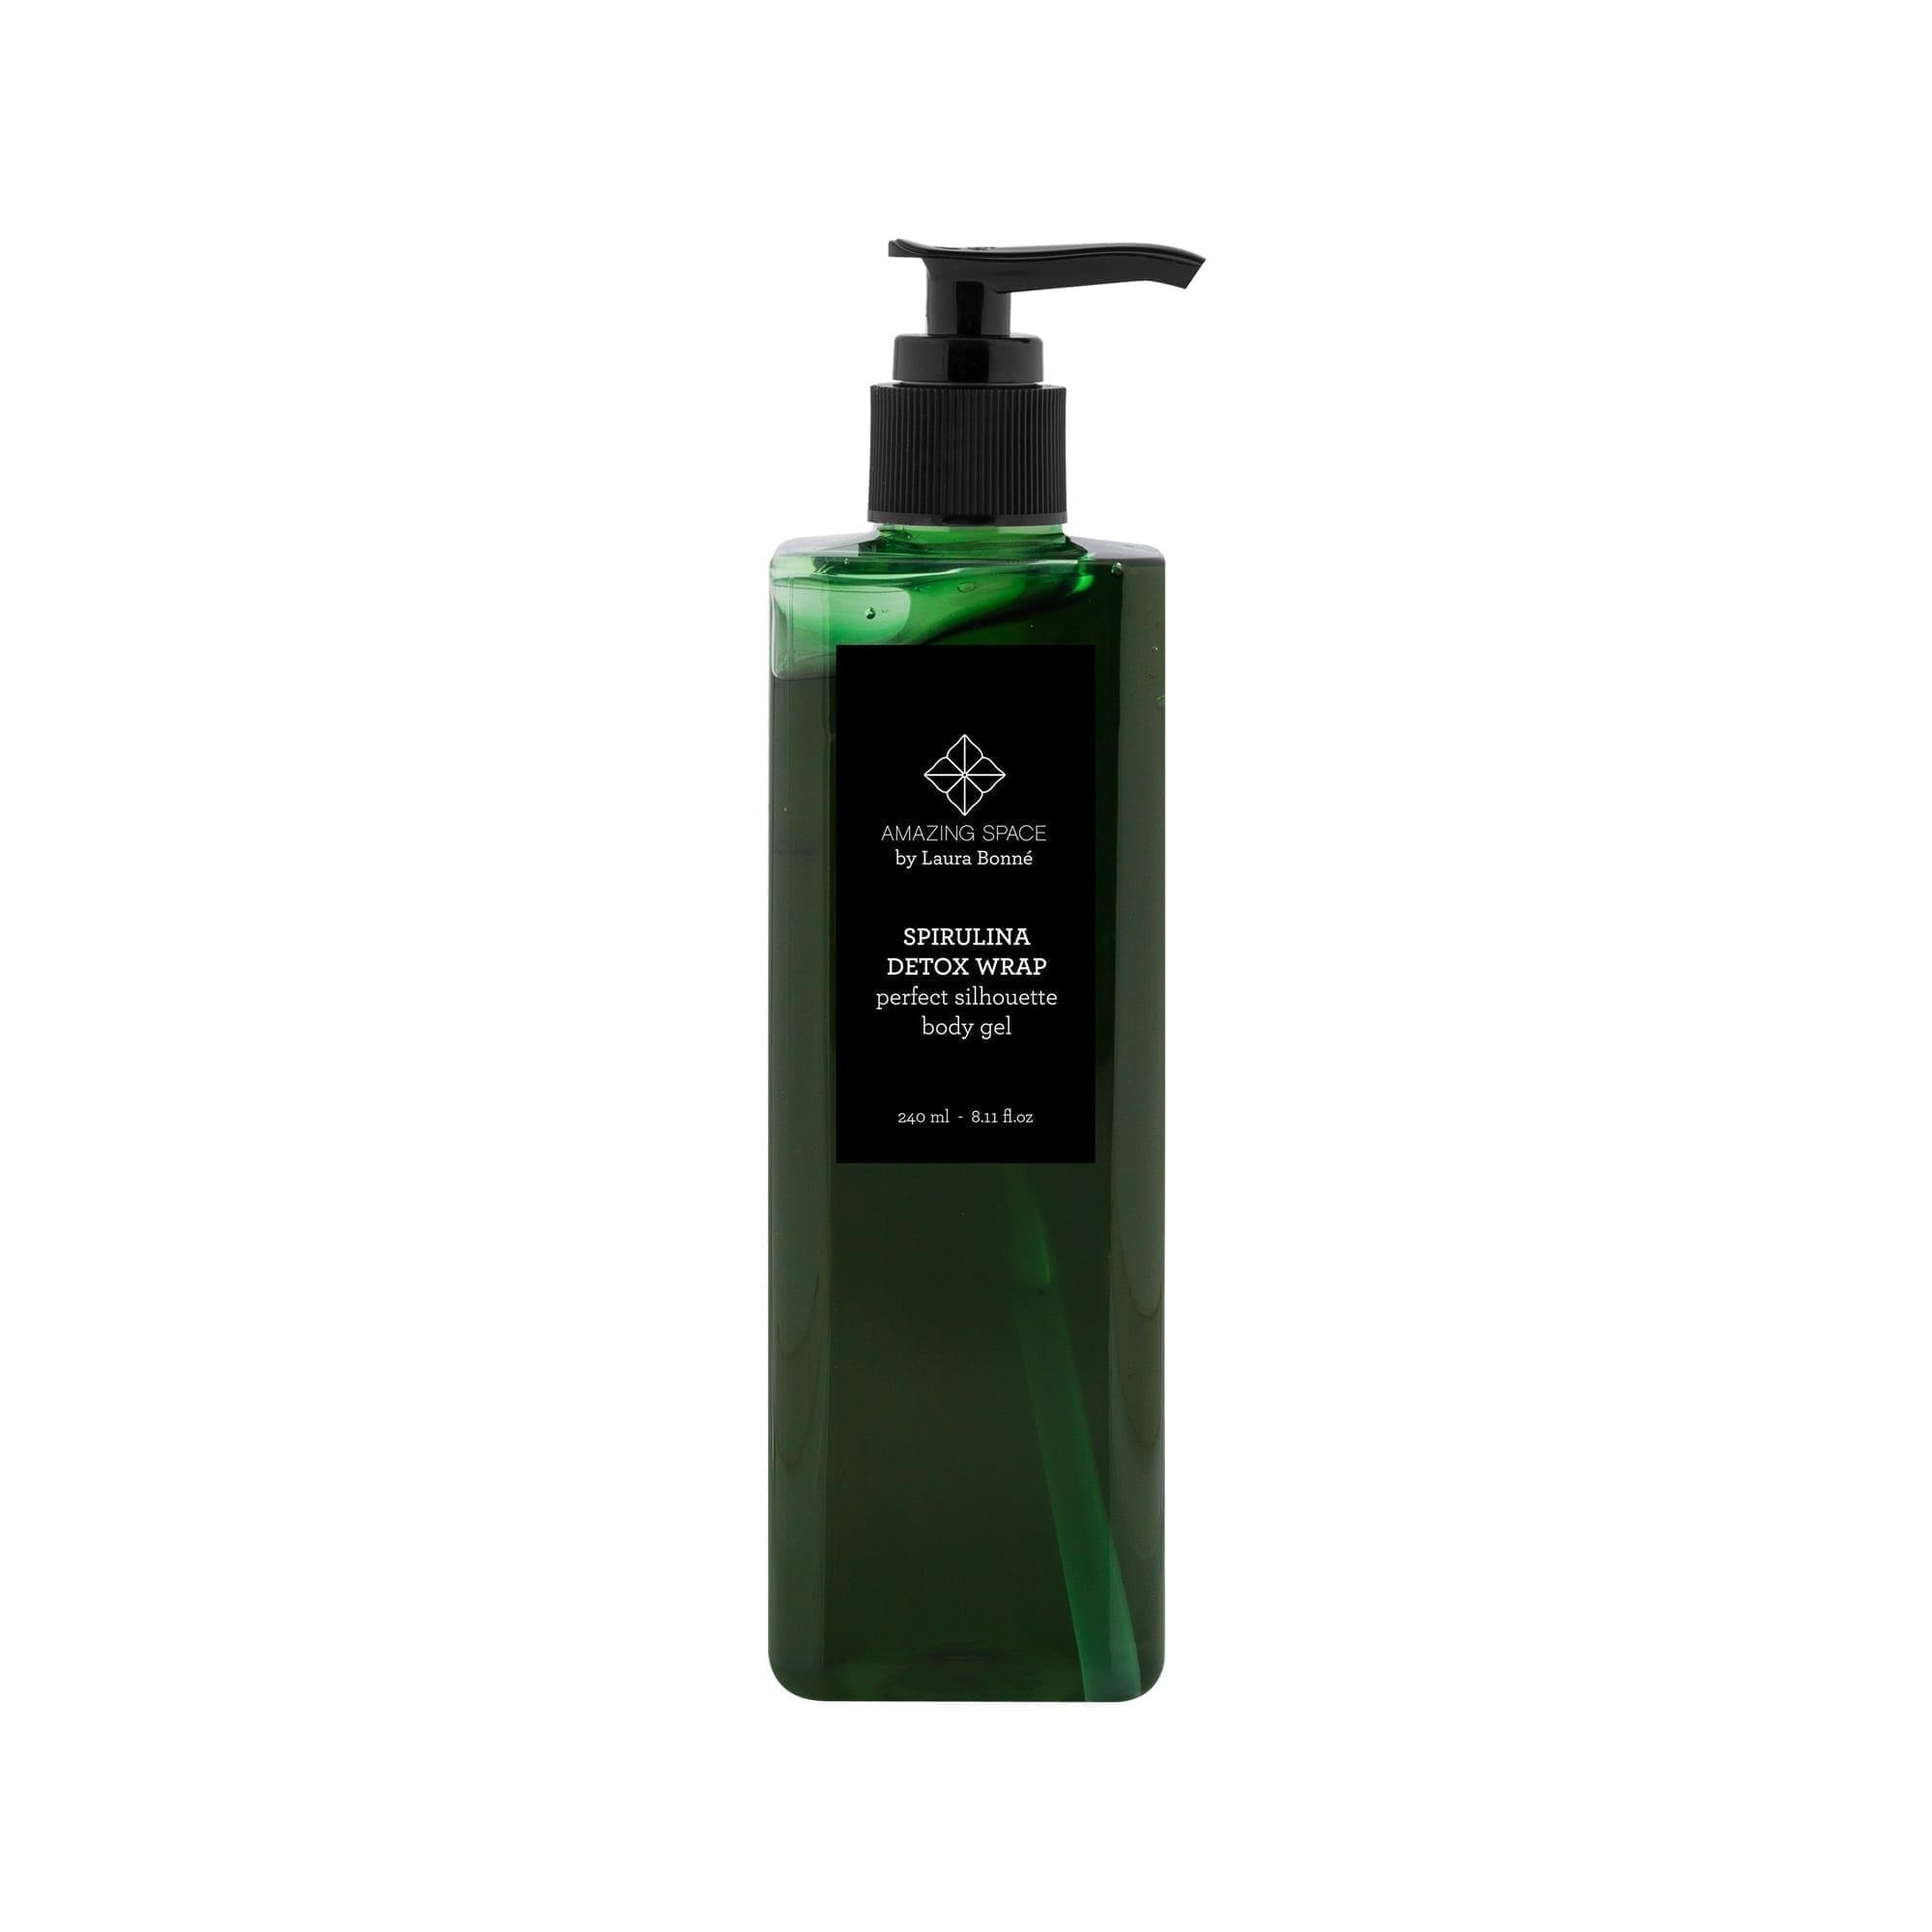 Spirulina Detox Wrap - Perfect Silhouette Body Gel (240ml) - Amazing Space